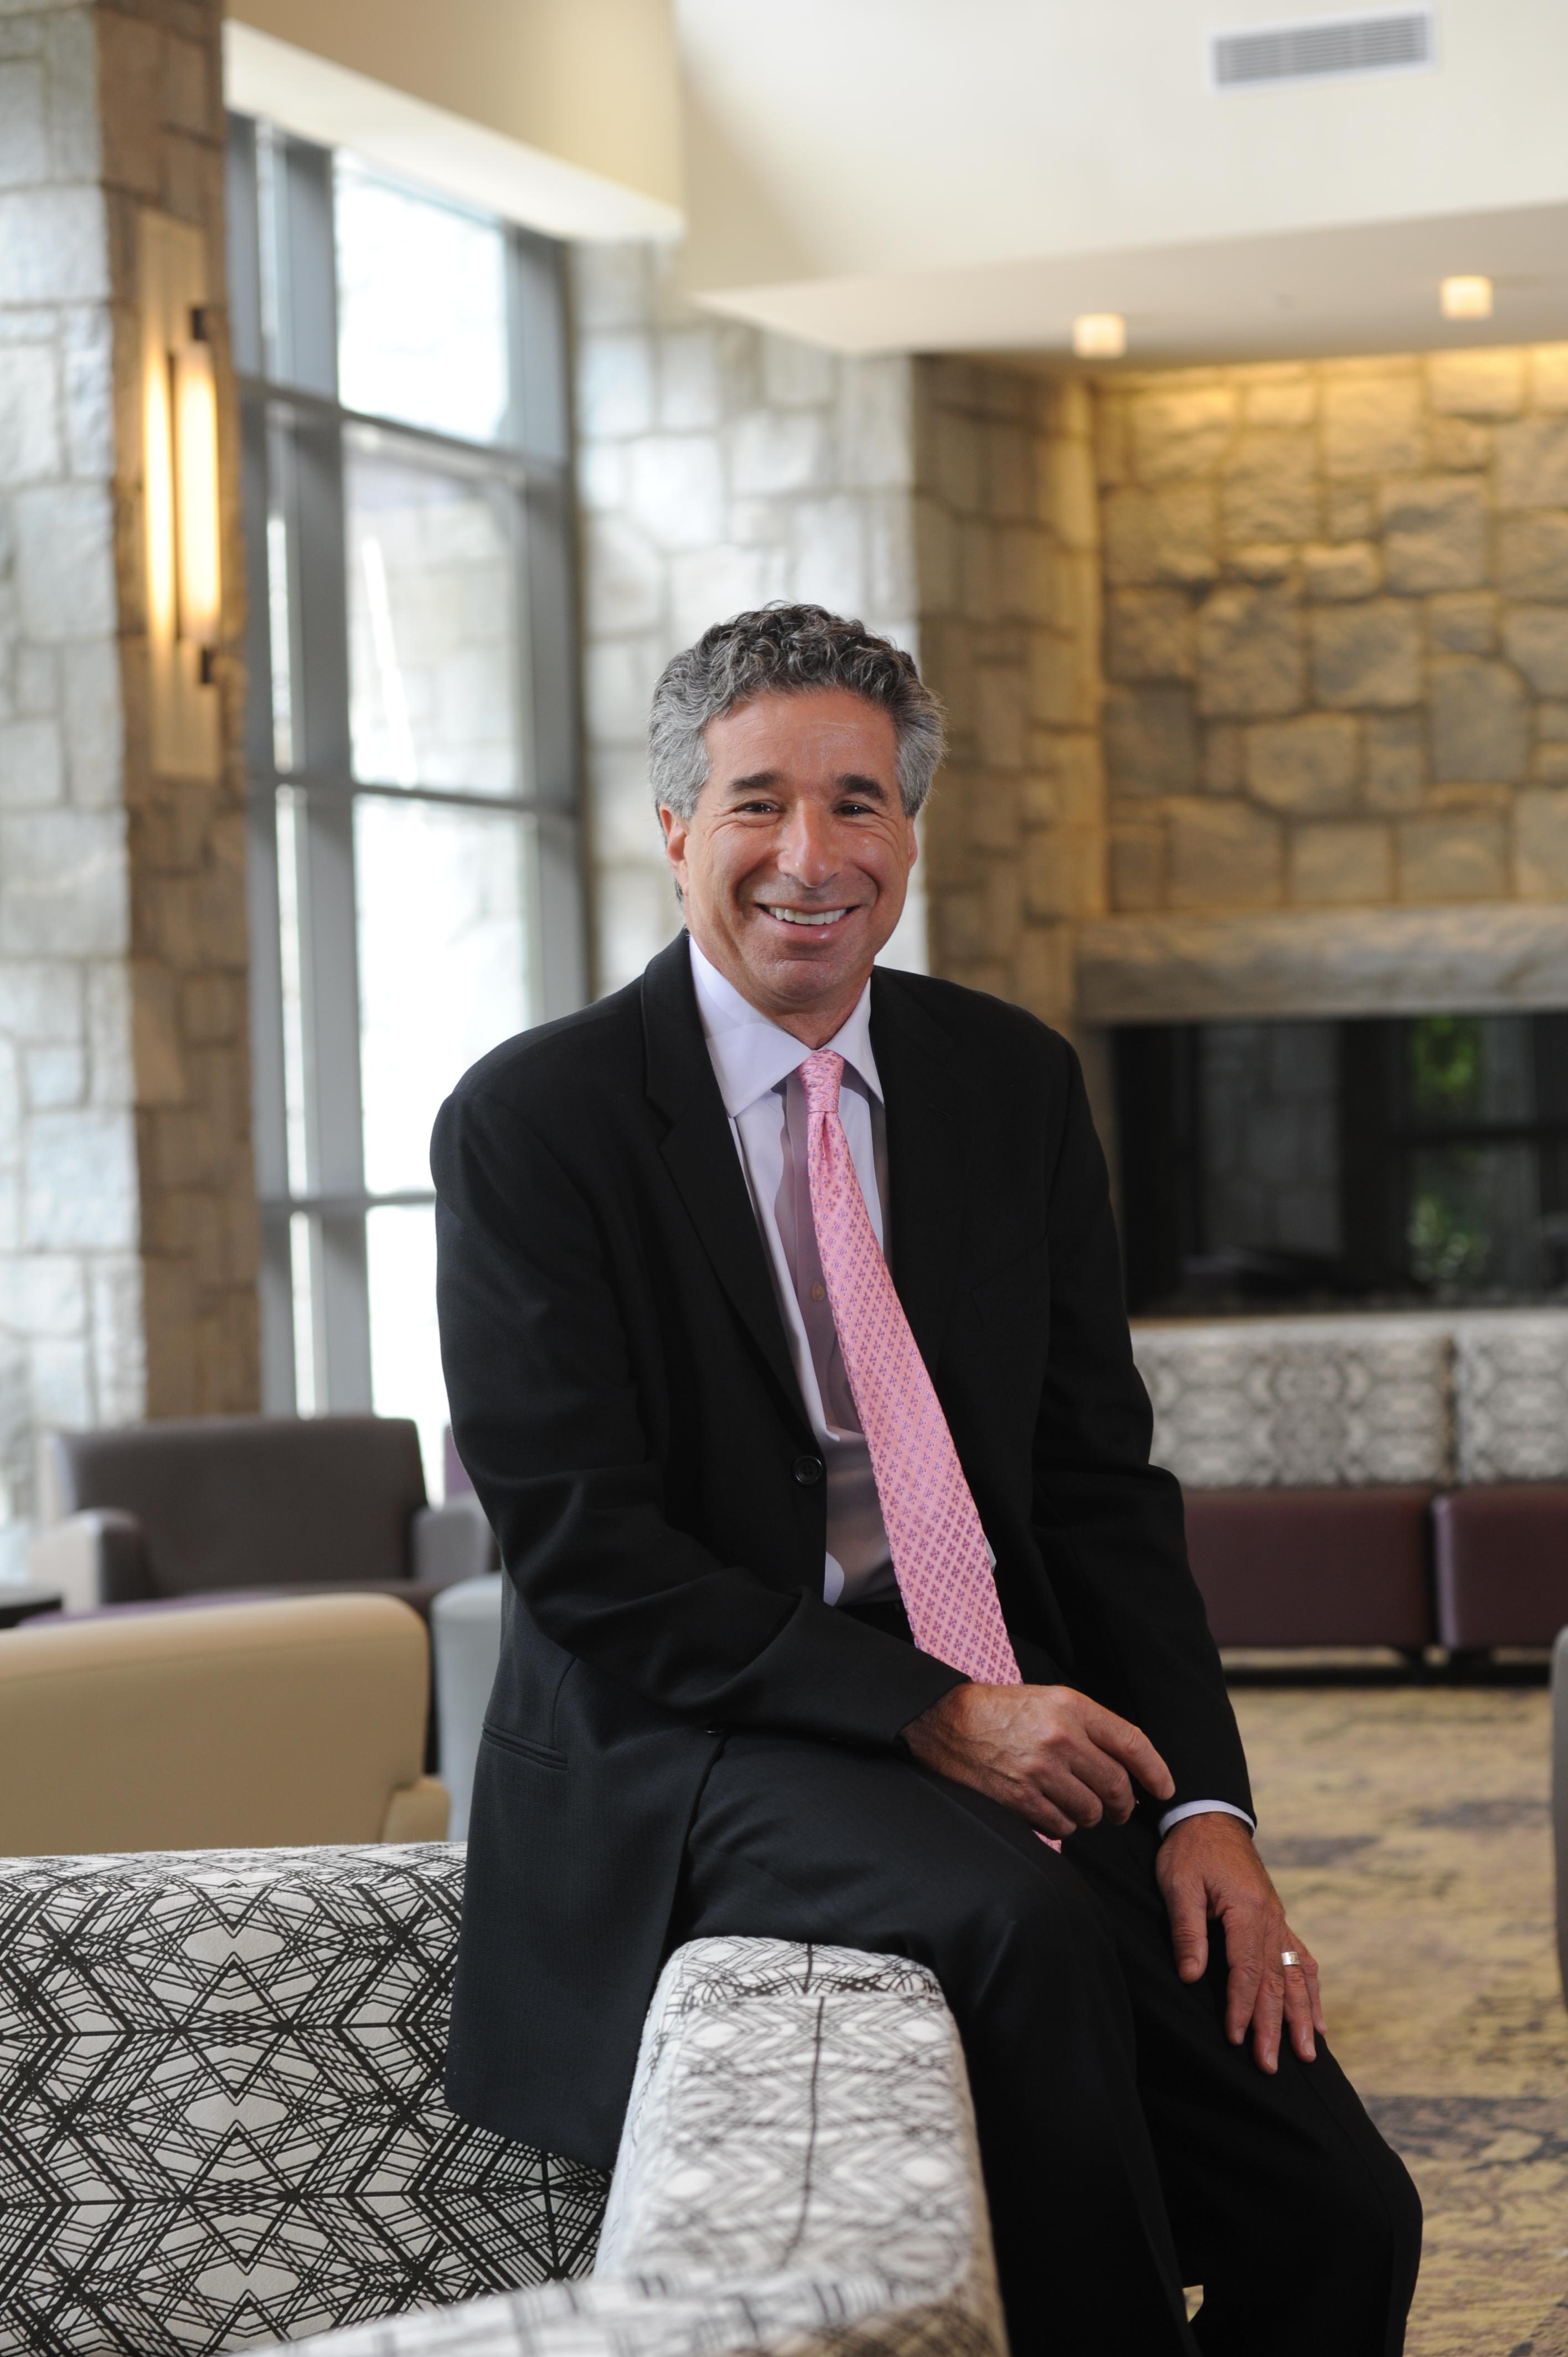 Oglethorpe University President Larry Schall